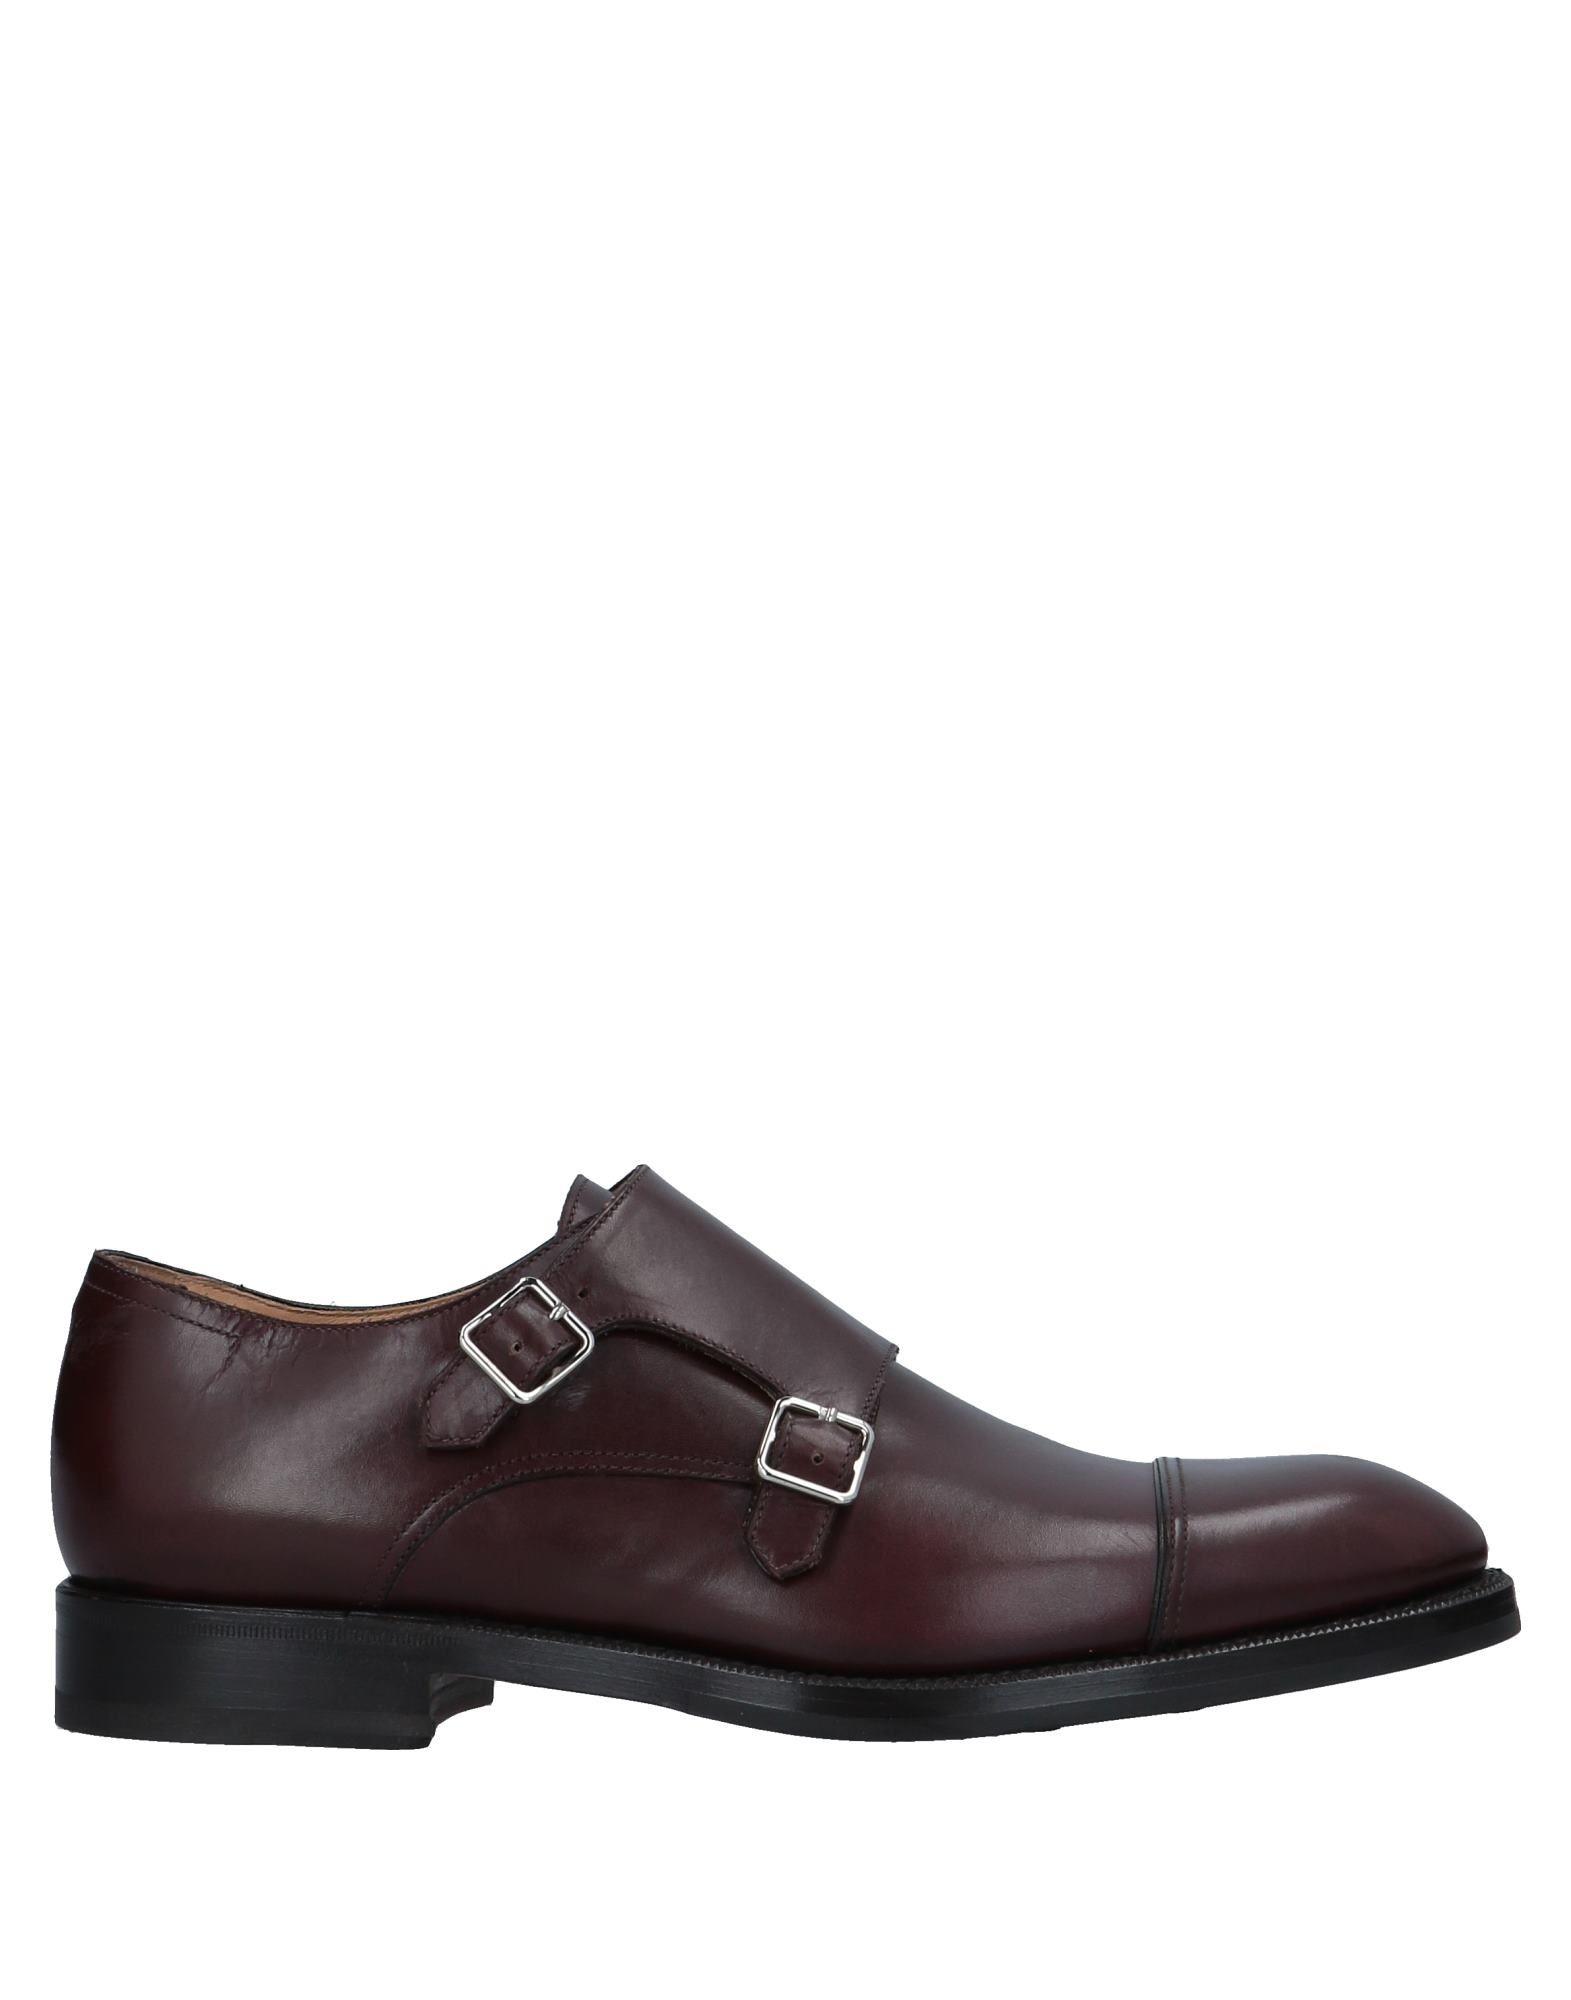 Peluso Napoli Mokassins Herren  11509270SF Gute Qualität beliebte Schuhe